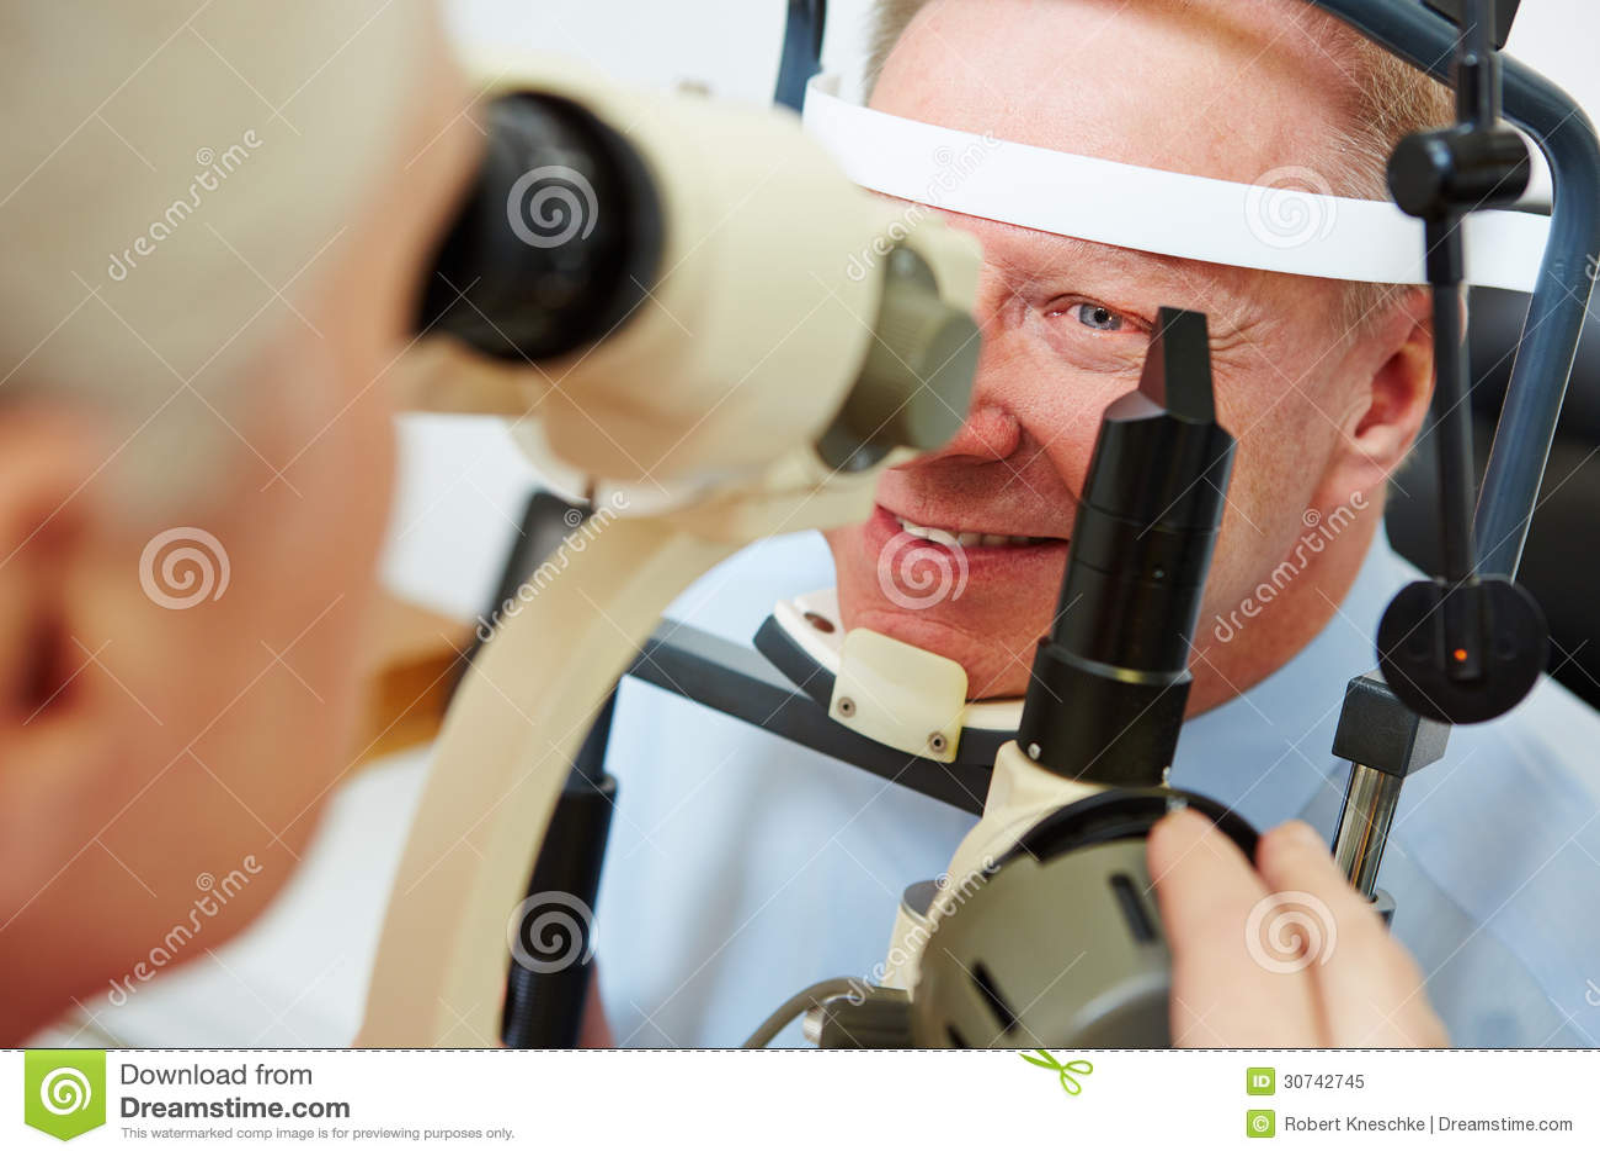 starting glaucoma treatm alternative - 1000×667